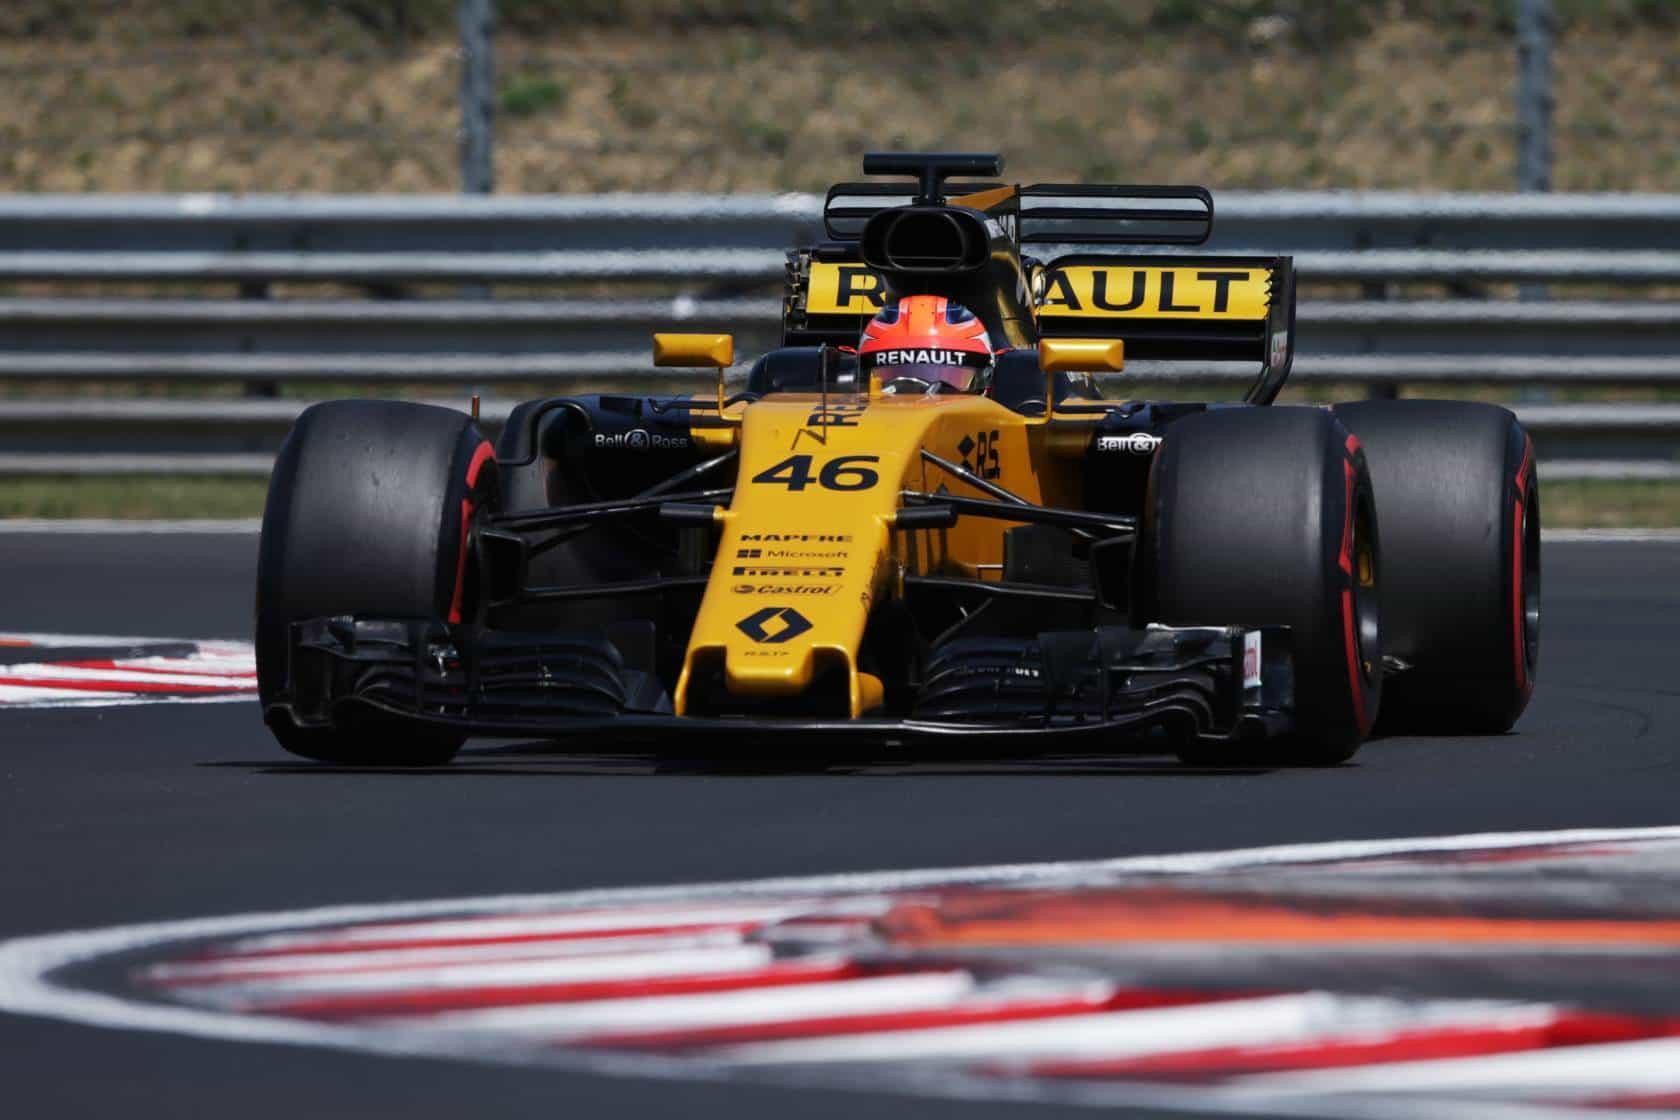 Kubica Renault chicane post Hungary F1 test day 2 Photo Renault